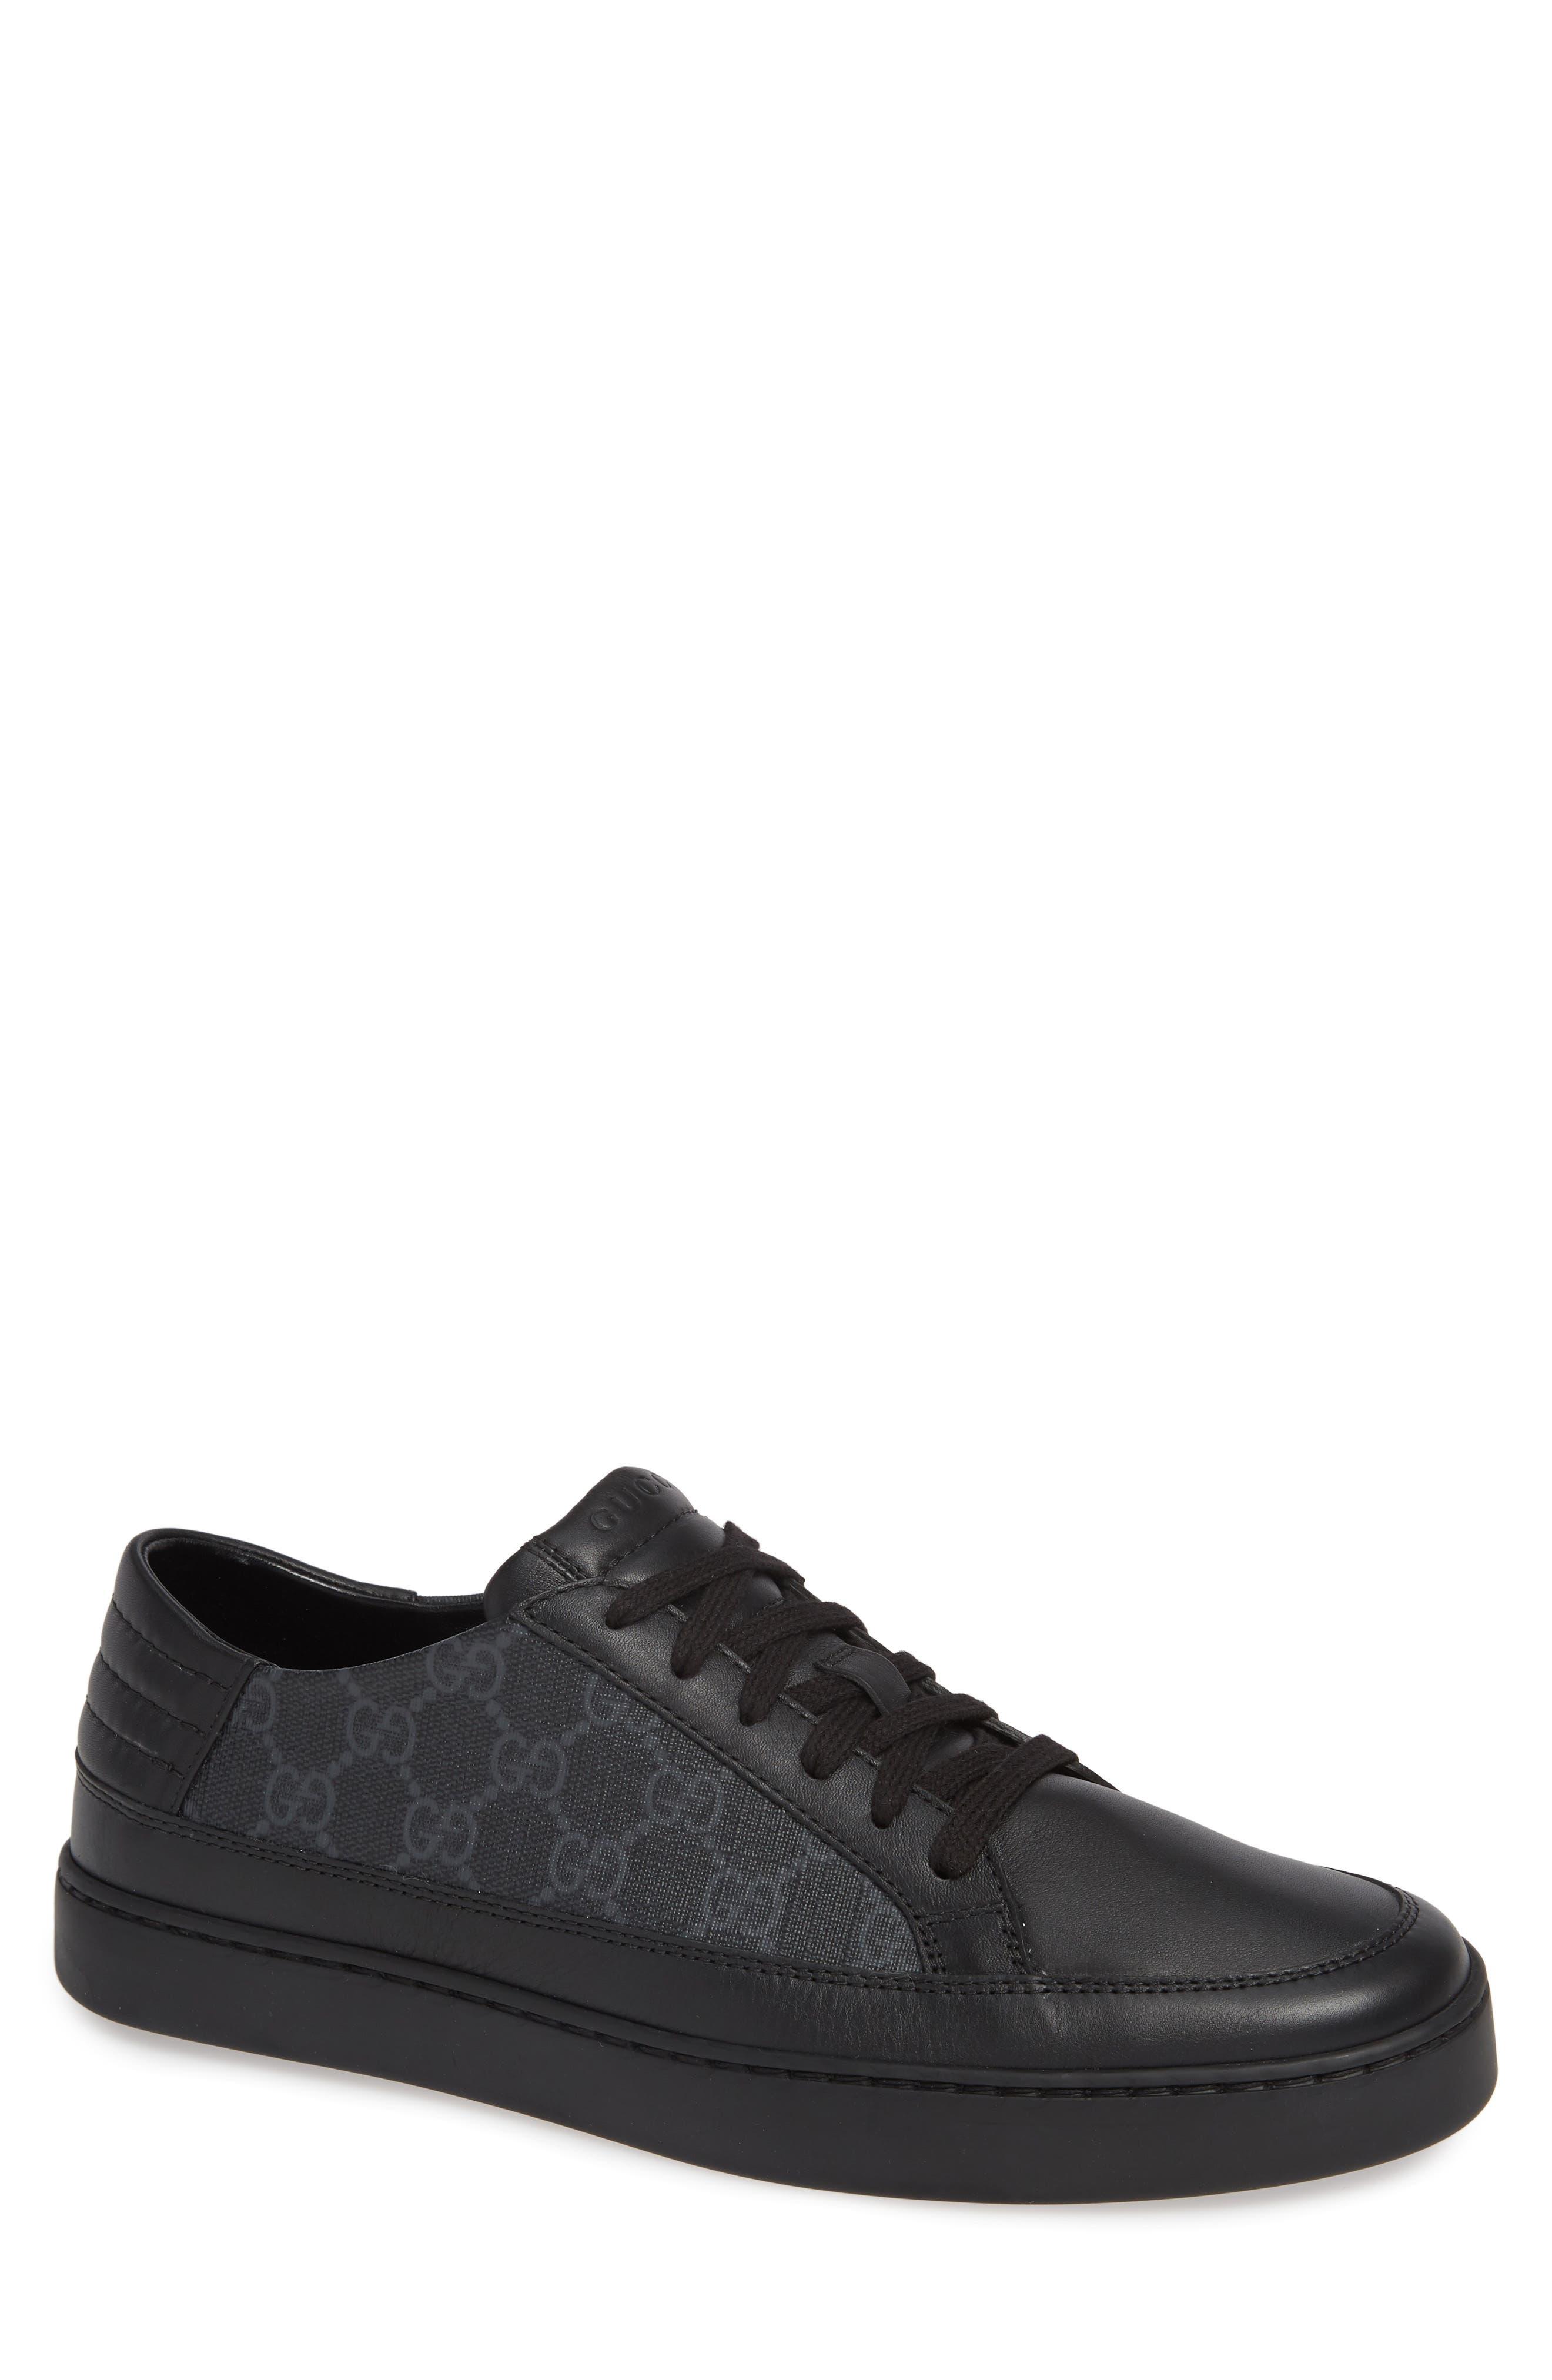 'Common' Low-Top Sneaker,                         Main,                         color, NERO/ BLACK